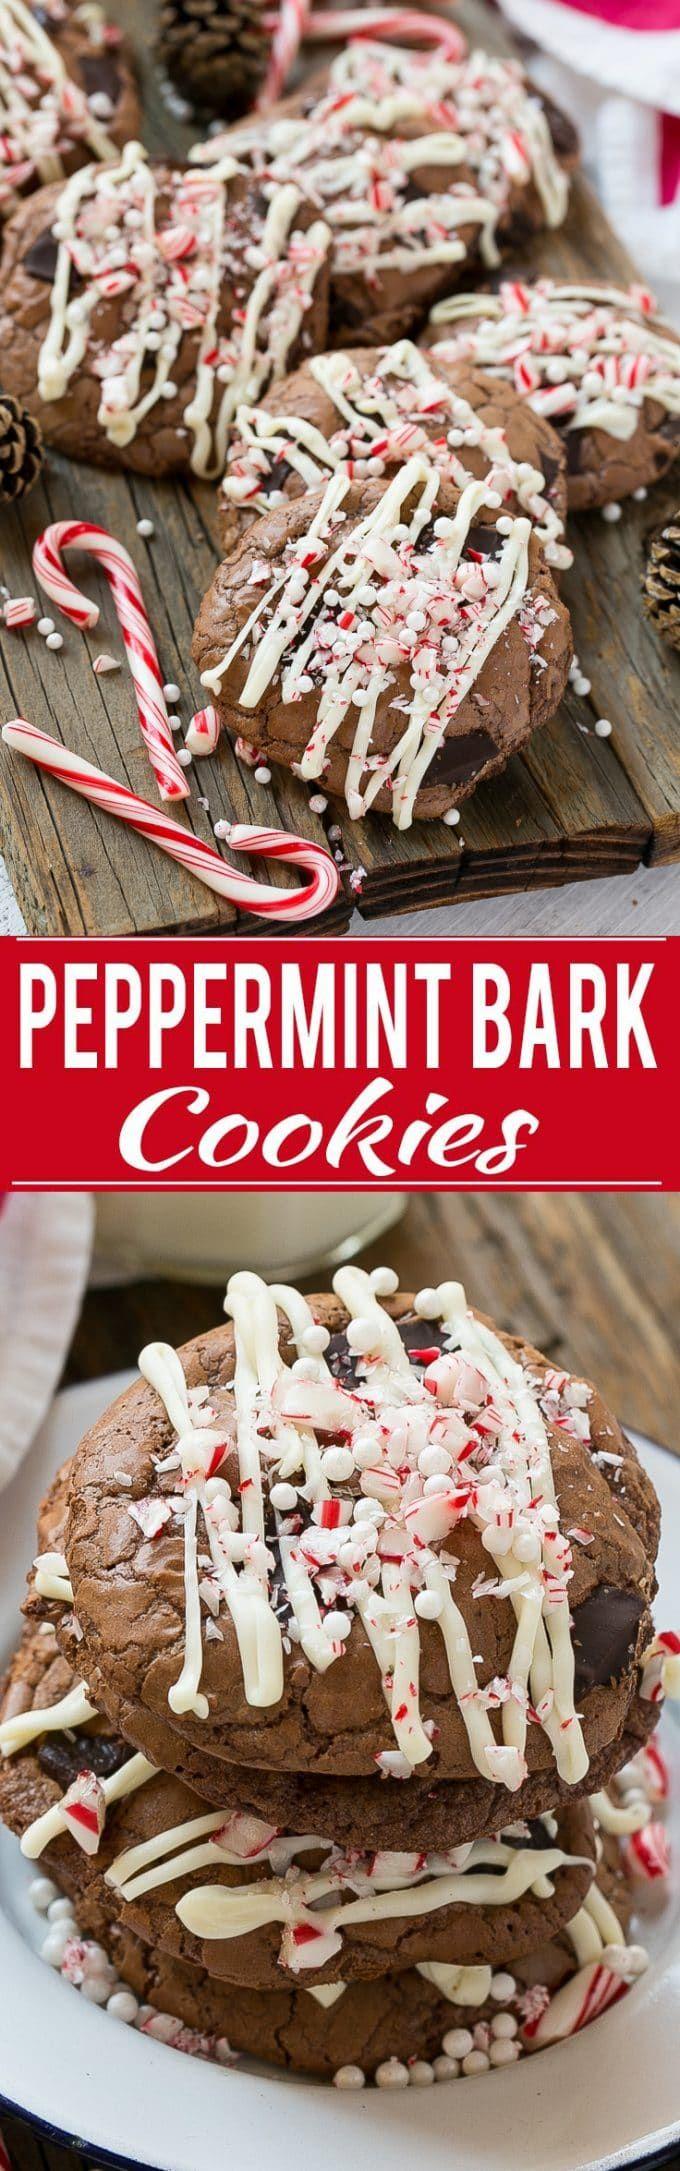 Peppermint Bark Cookie Recipe Peppermint Bark Cookies Best Peppermint Bark Peppermint Bark Cookie Recipes Peppermint Bark Cookie Cookies Recipes Christmas